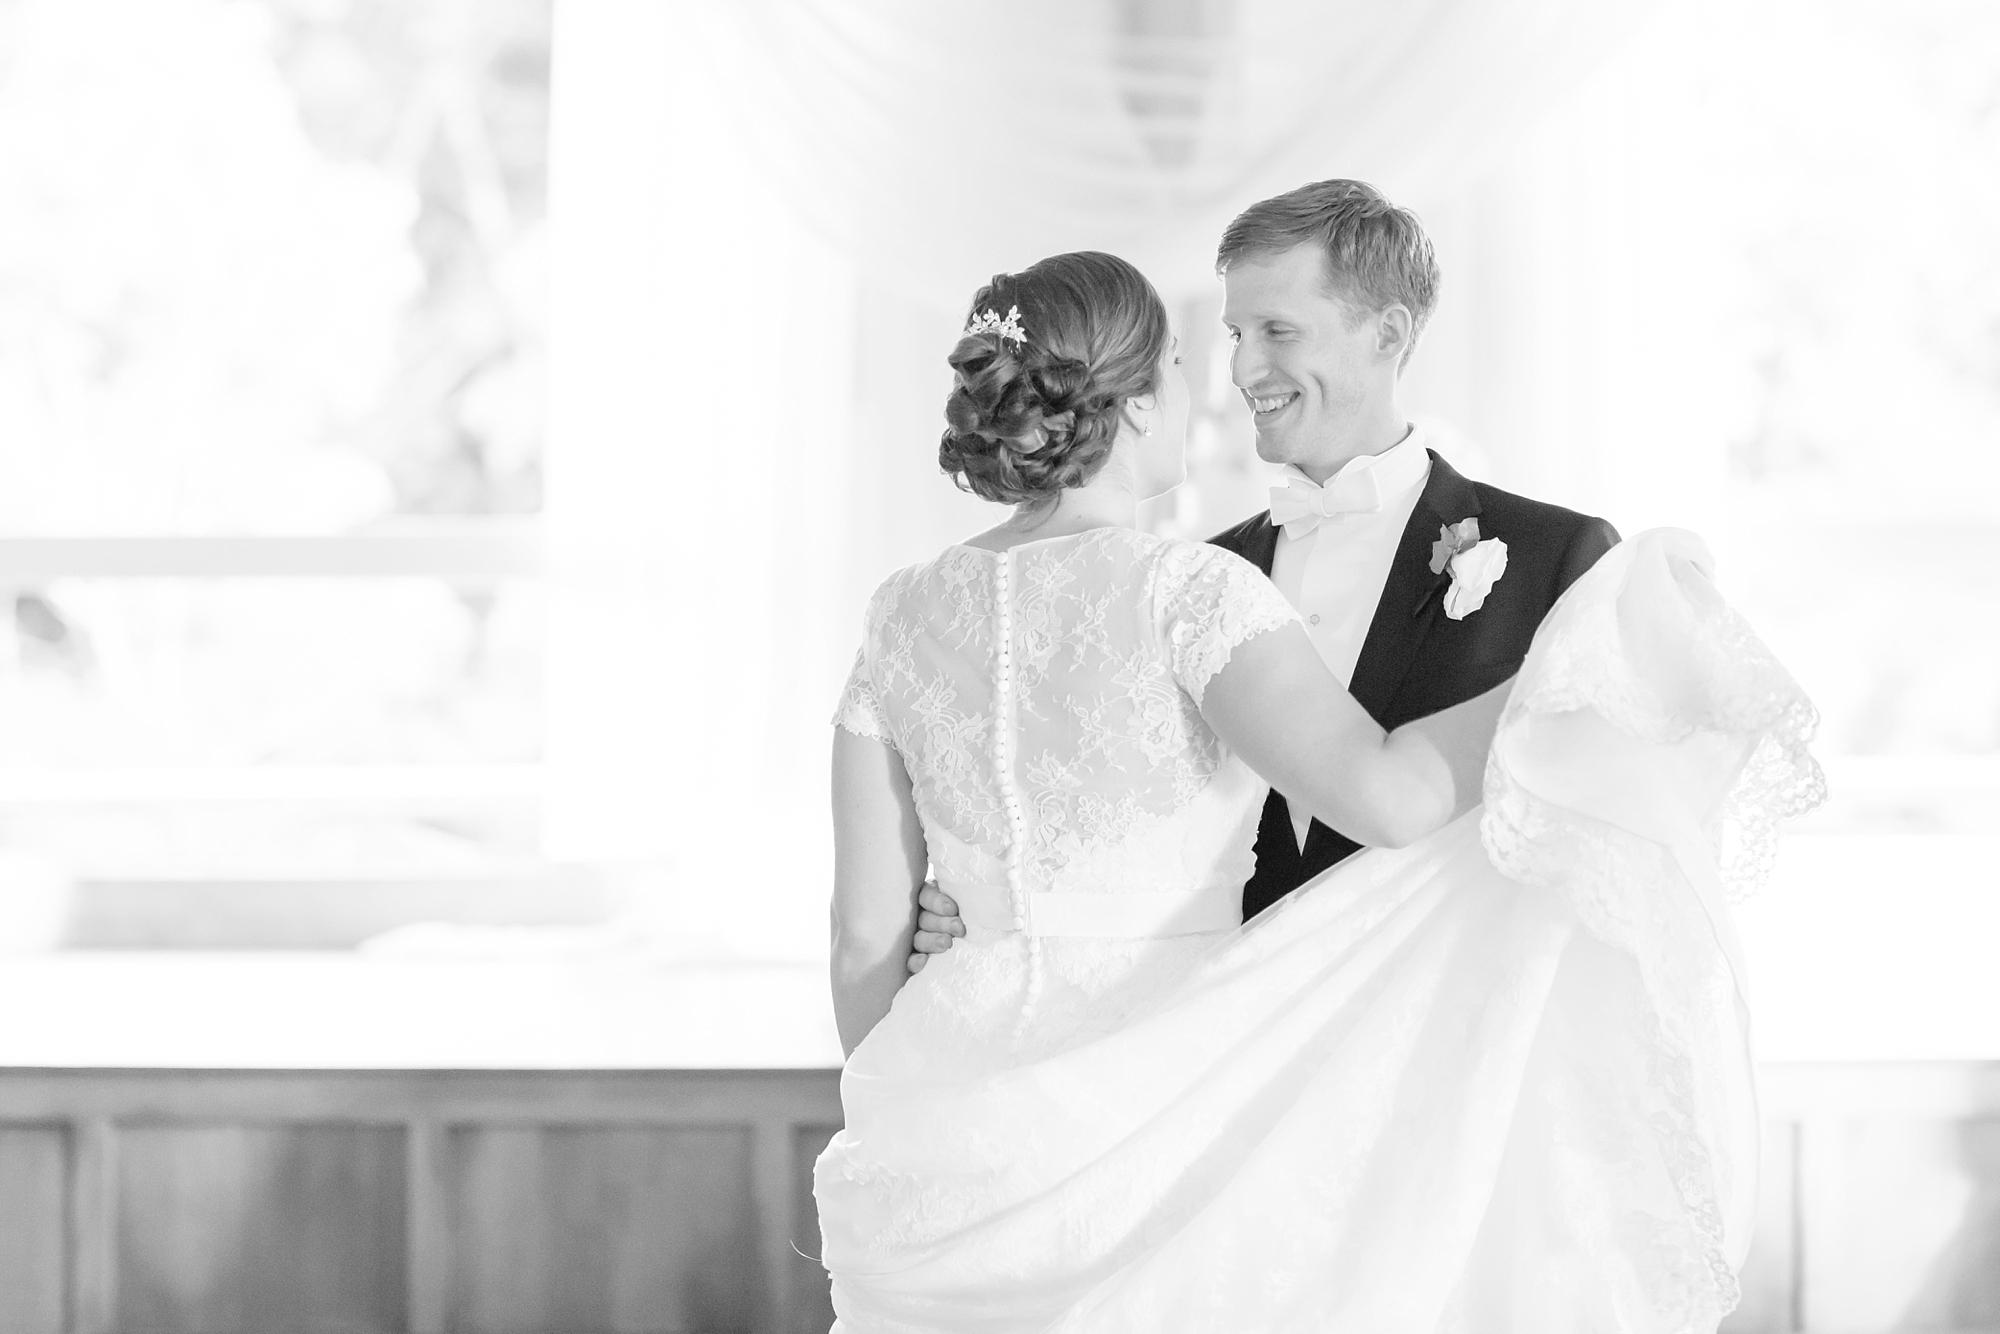 Somerville 6-Reception-393_anna grace photography sherwood forest annapolis maryland wedding photographer photo.jpg